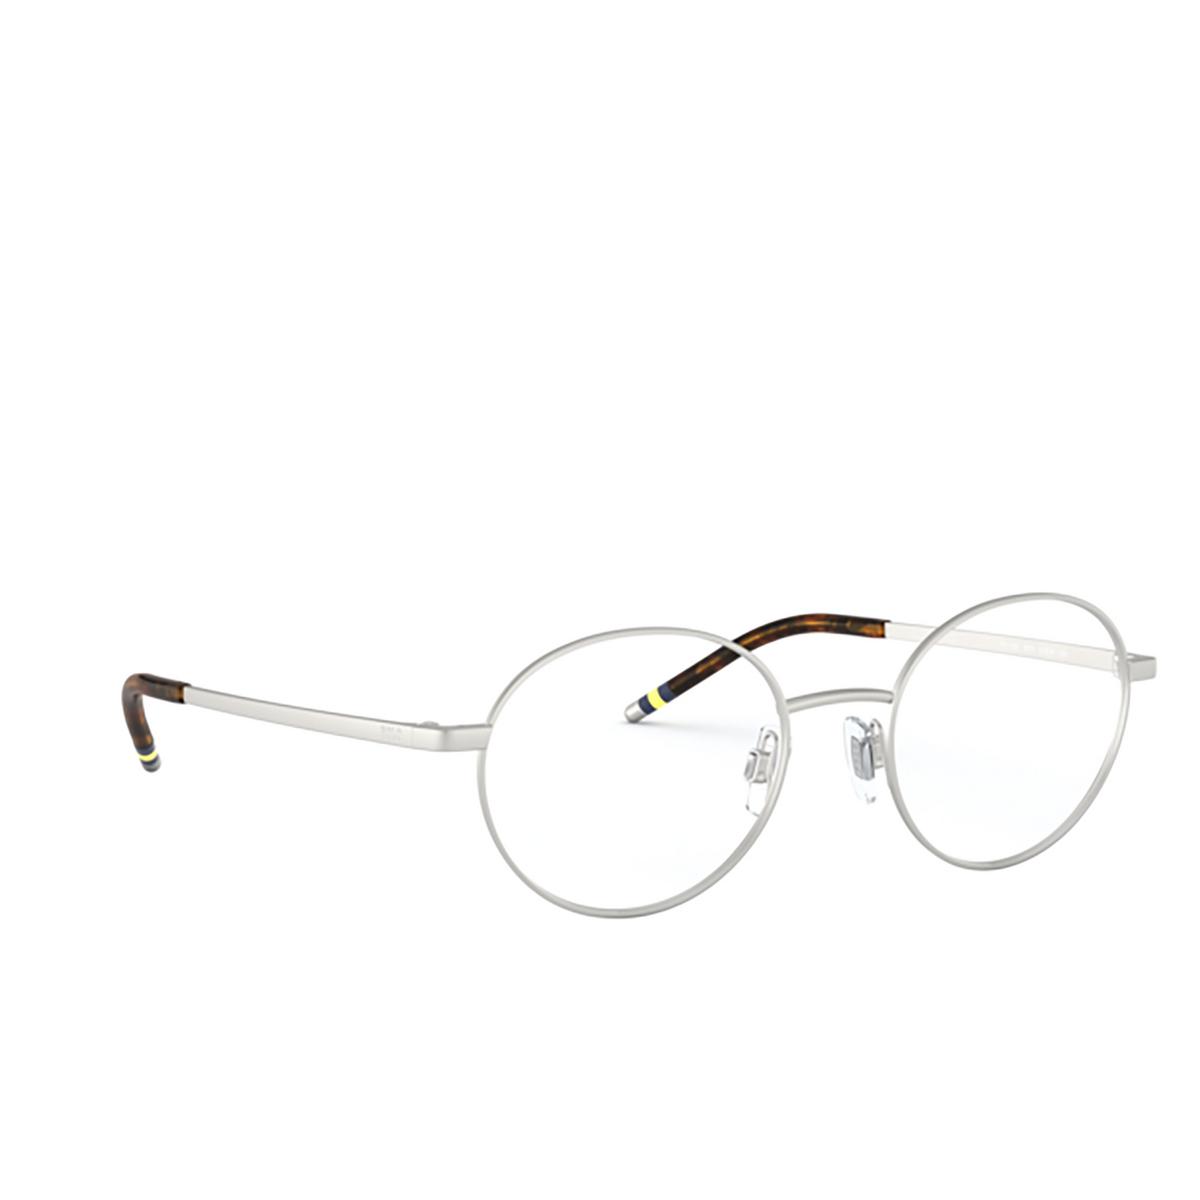 Polo Ralph Lauren® Oval Eyeglasses: PH1193 color Matte Silver 9010.